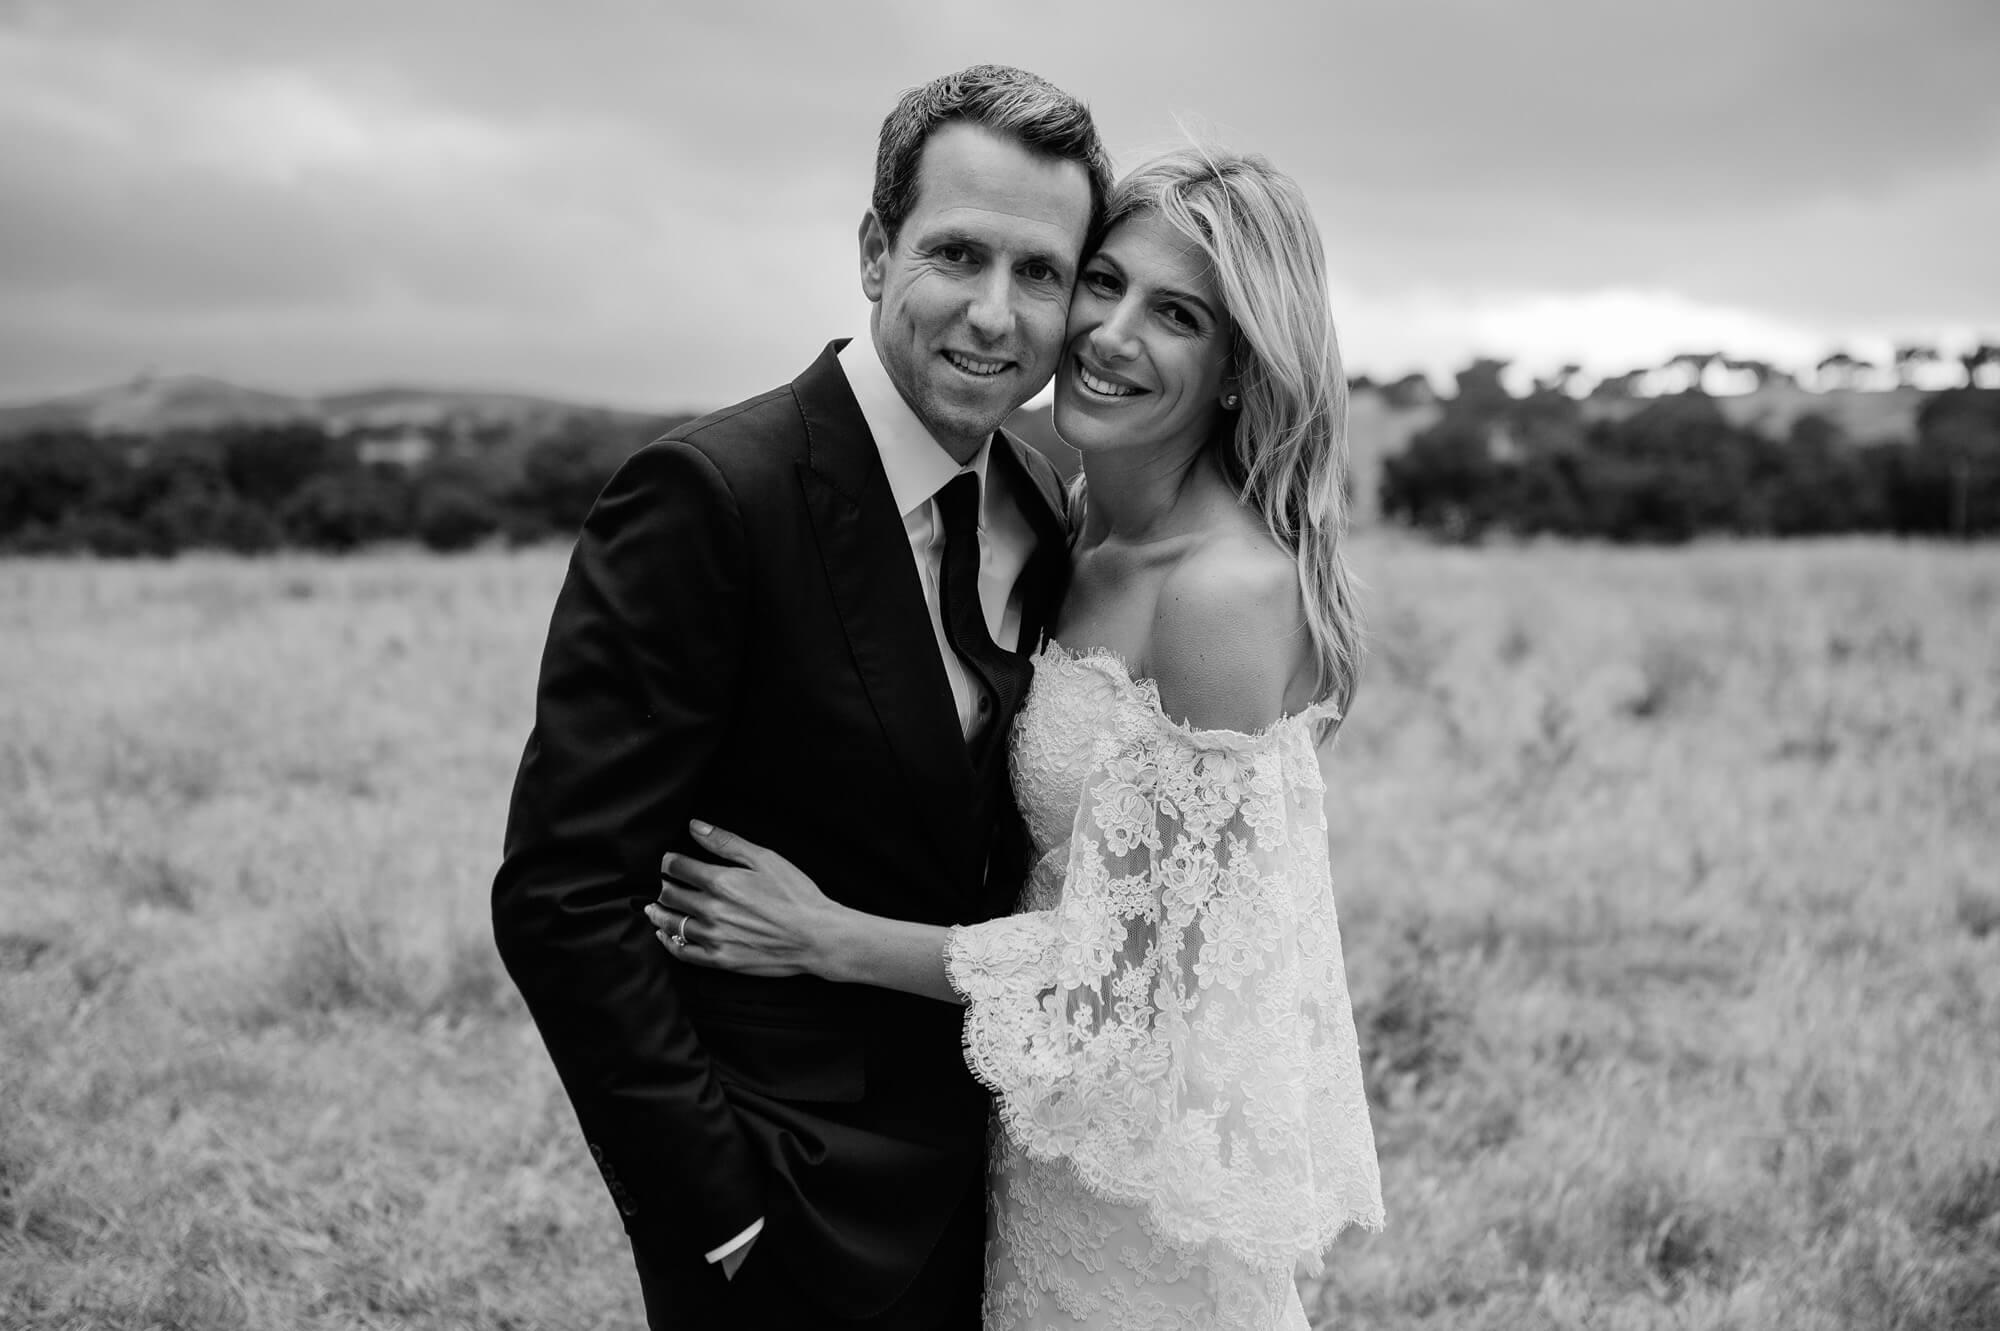 los-olivos-firestone-winery-destination-wedding-central-coast-wedding-photographer-17.jpg